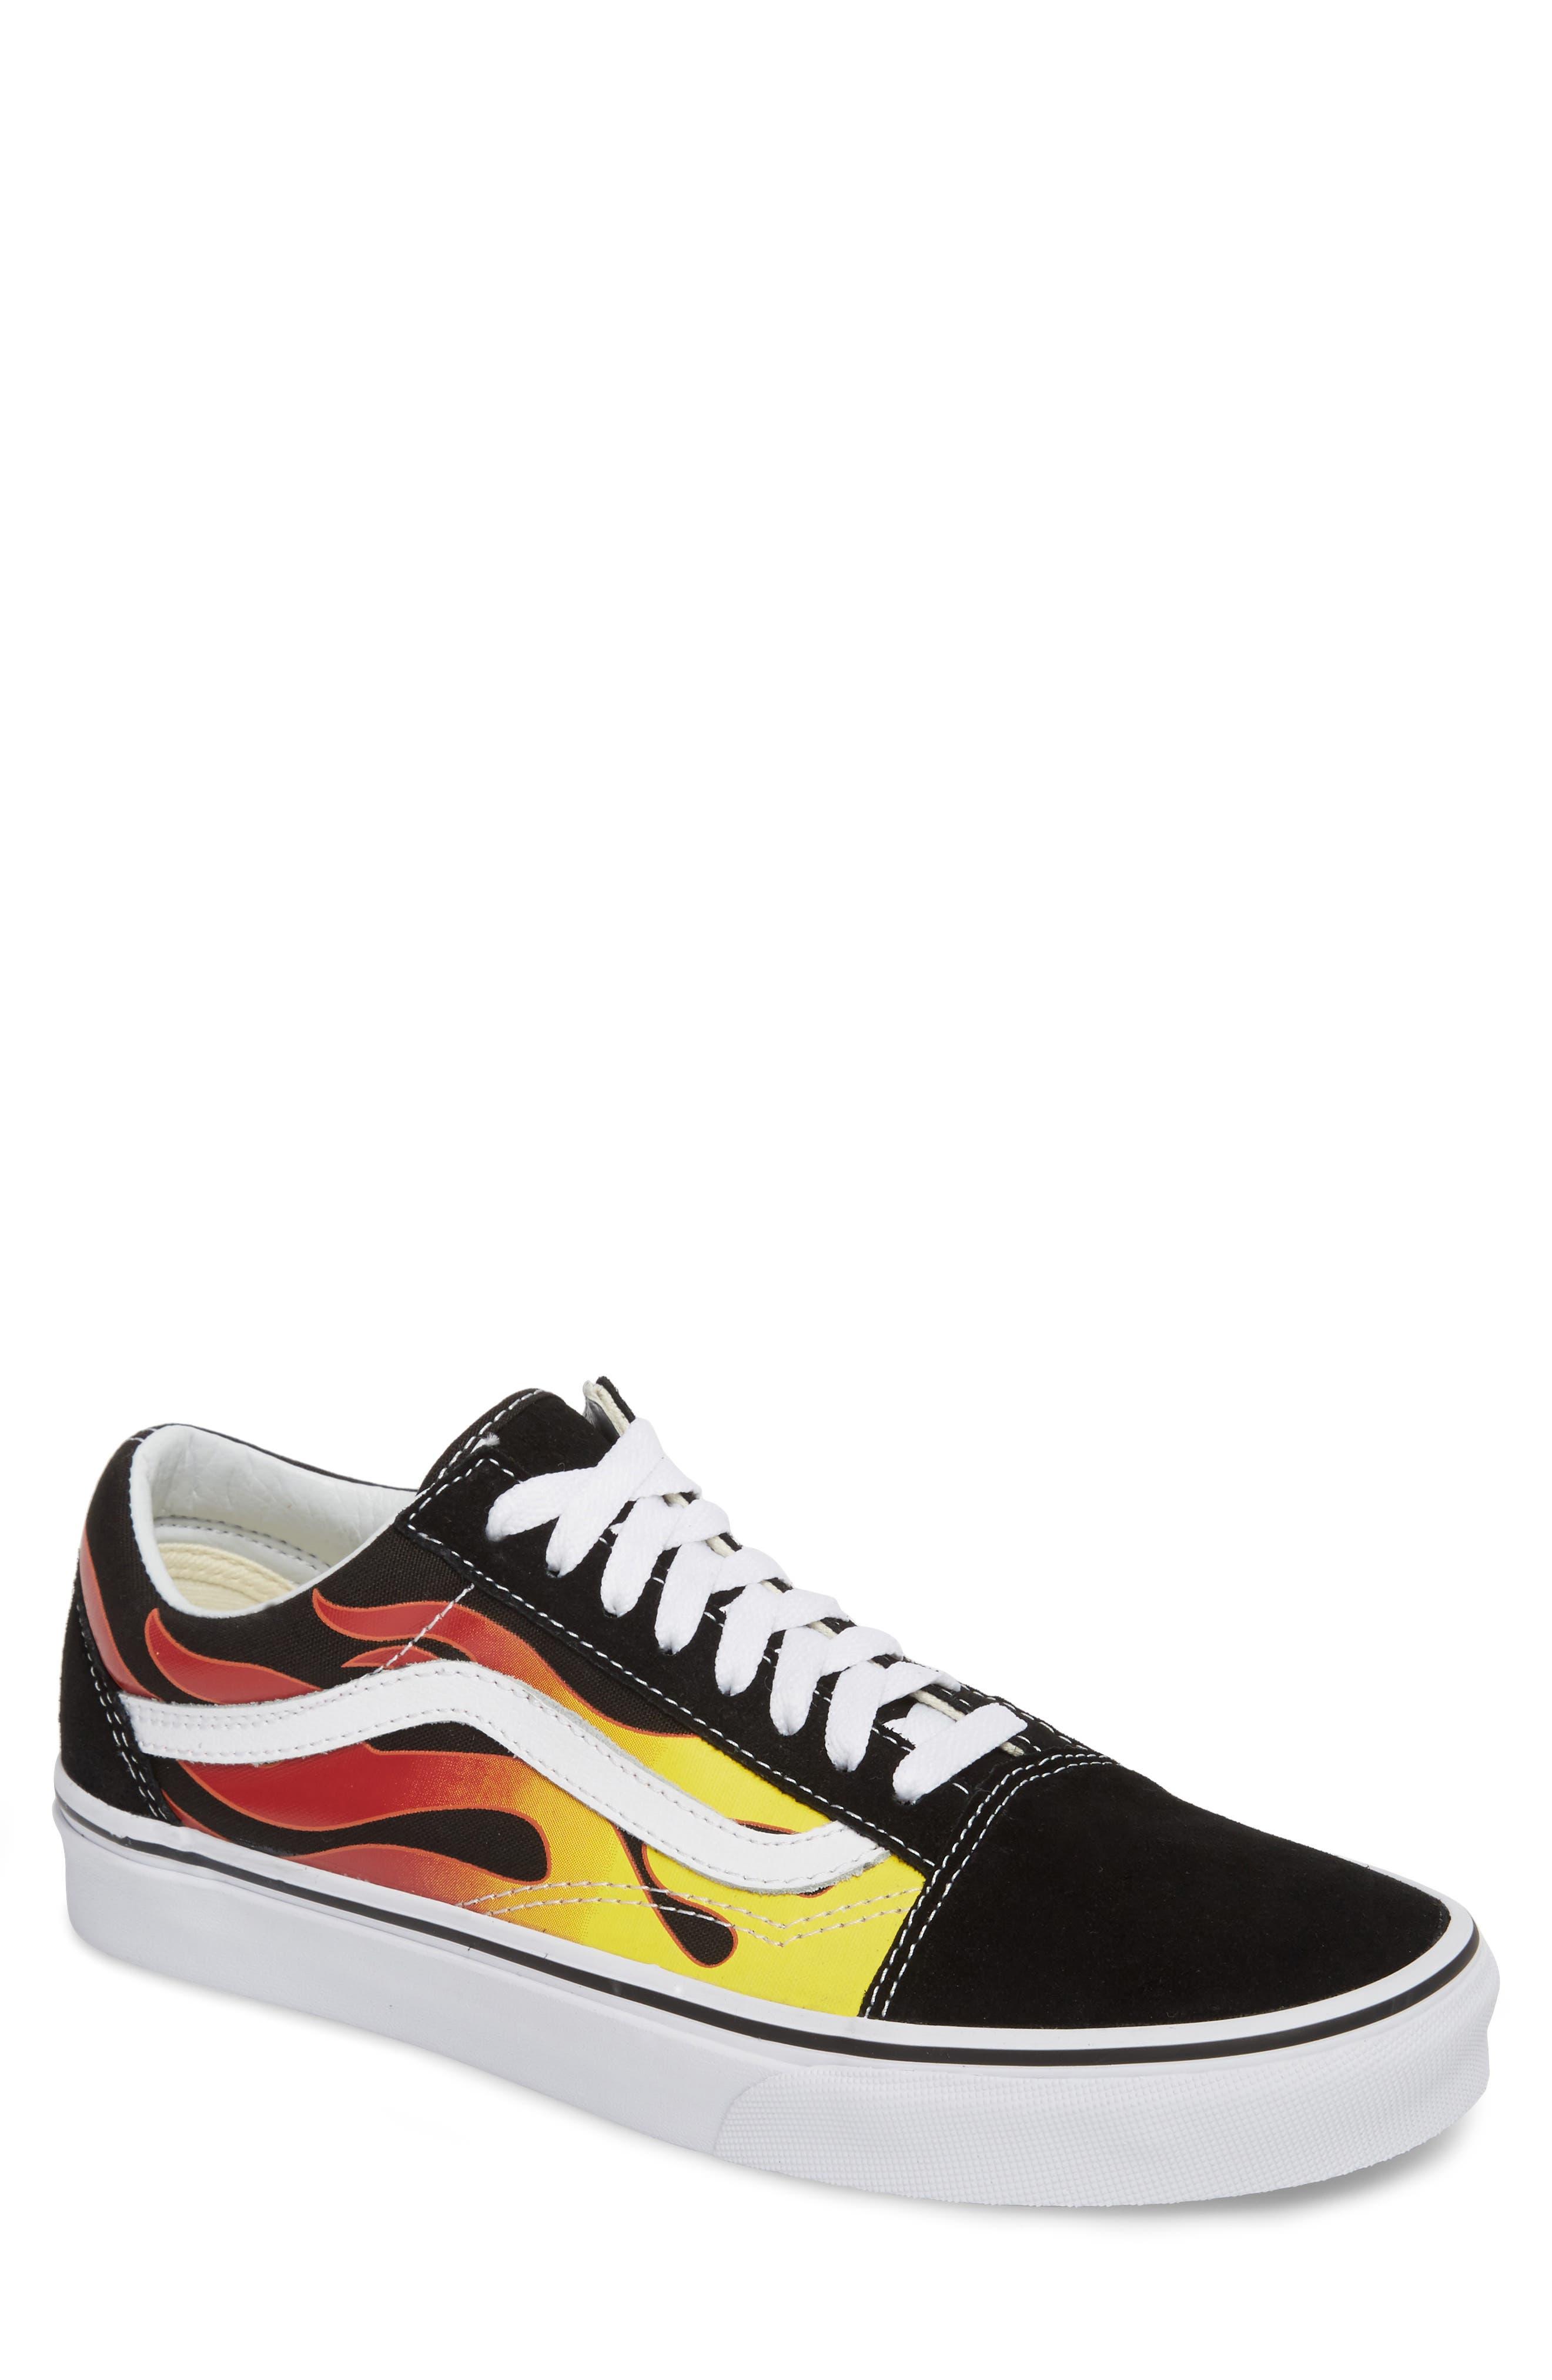 Main Image - Vans UA Old Skool Low Top Sneaker (Men)